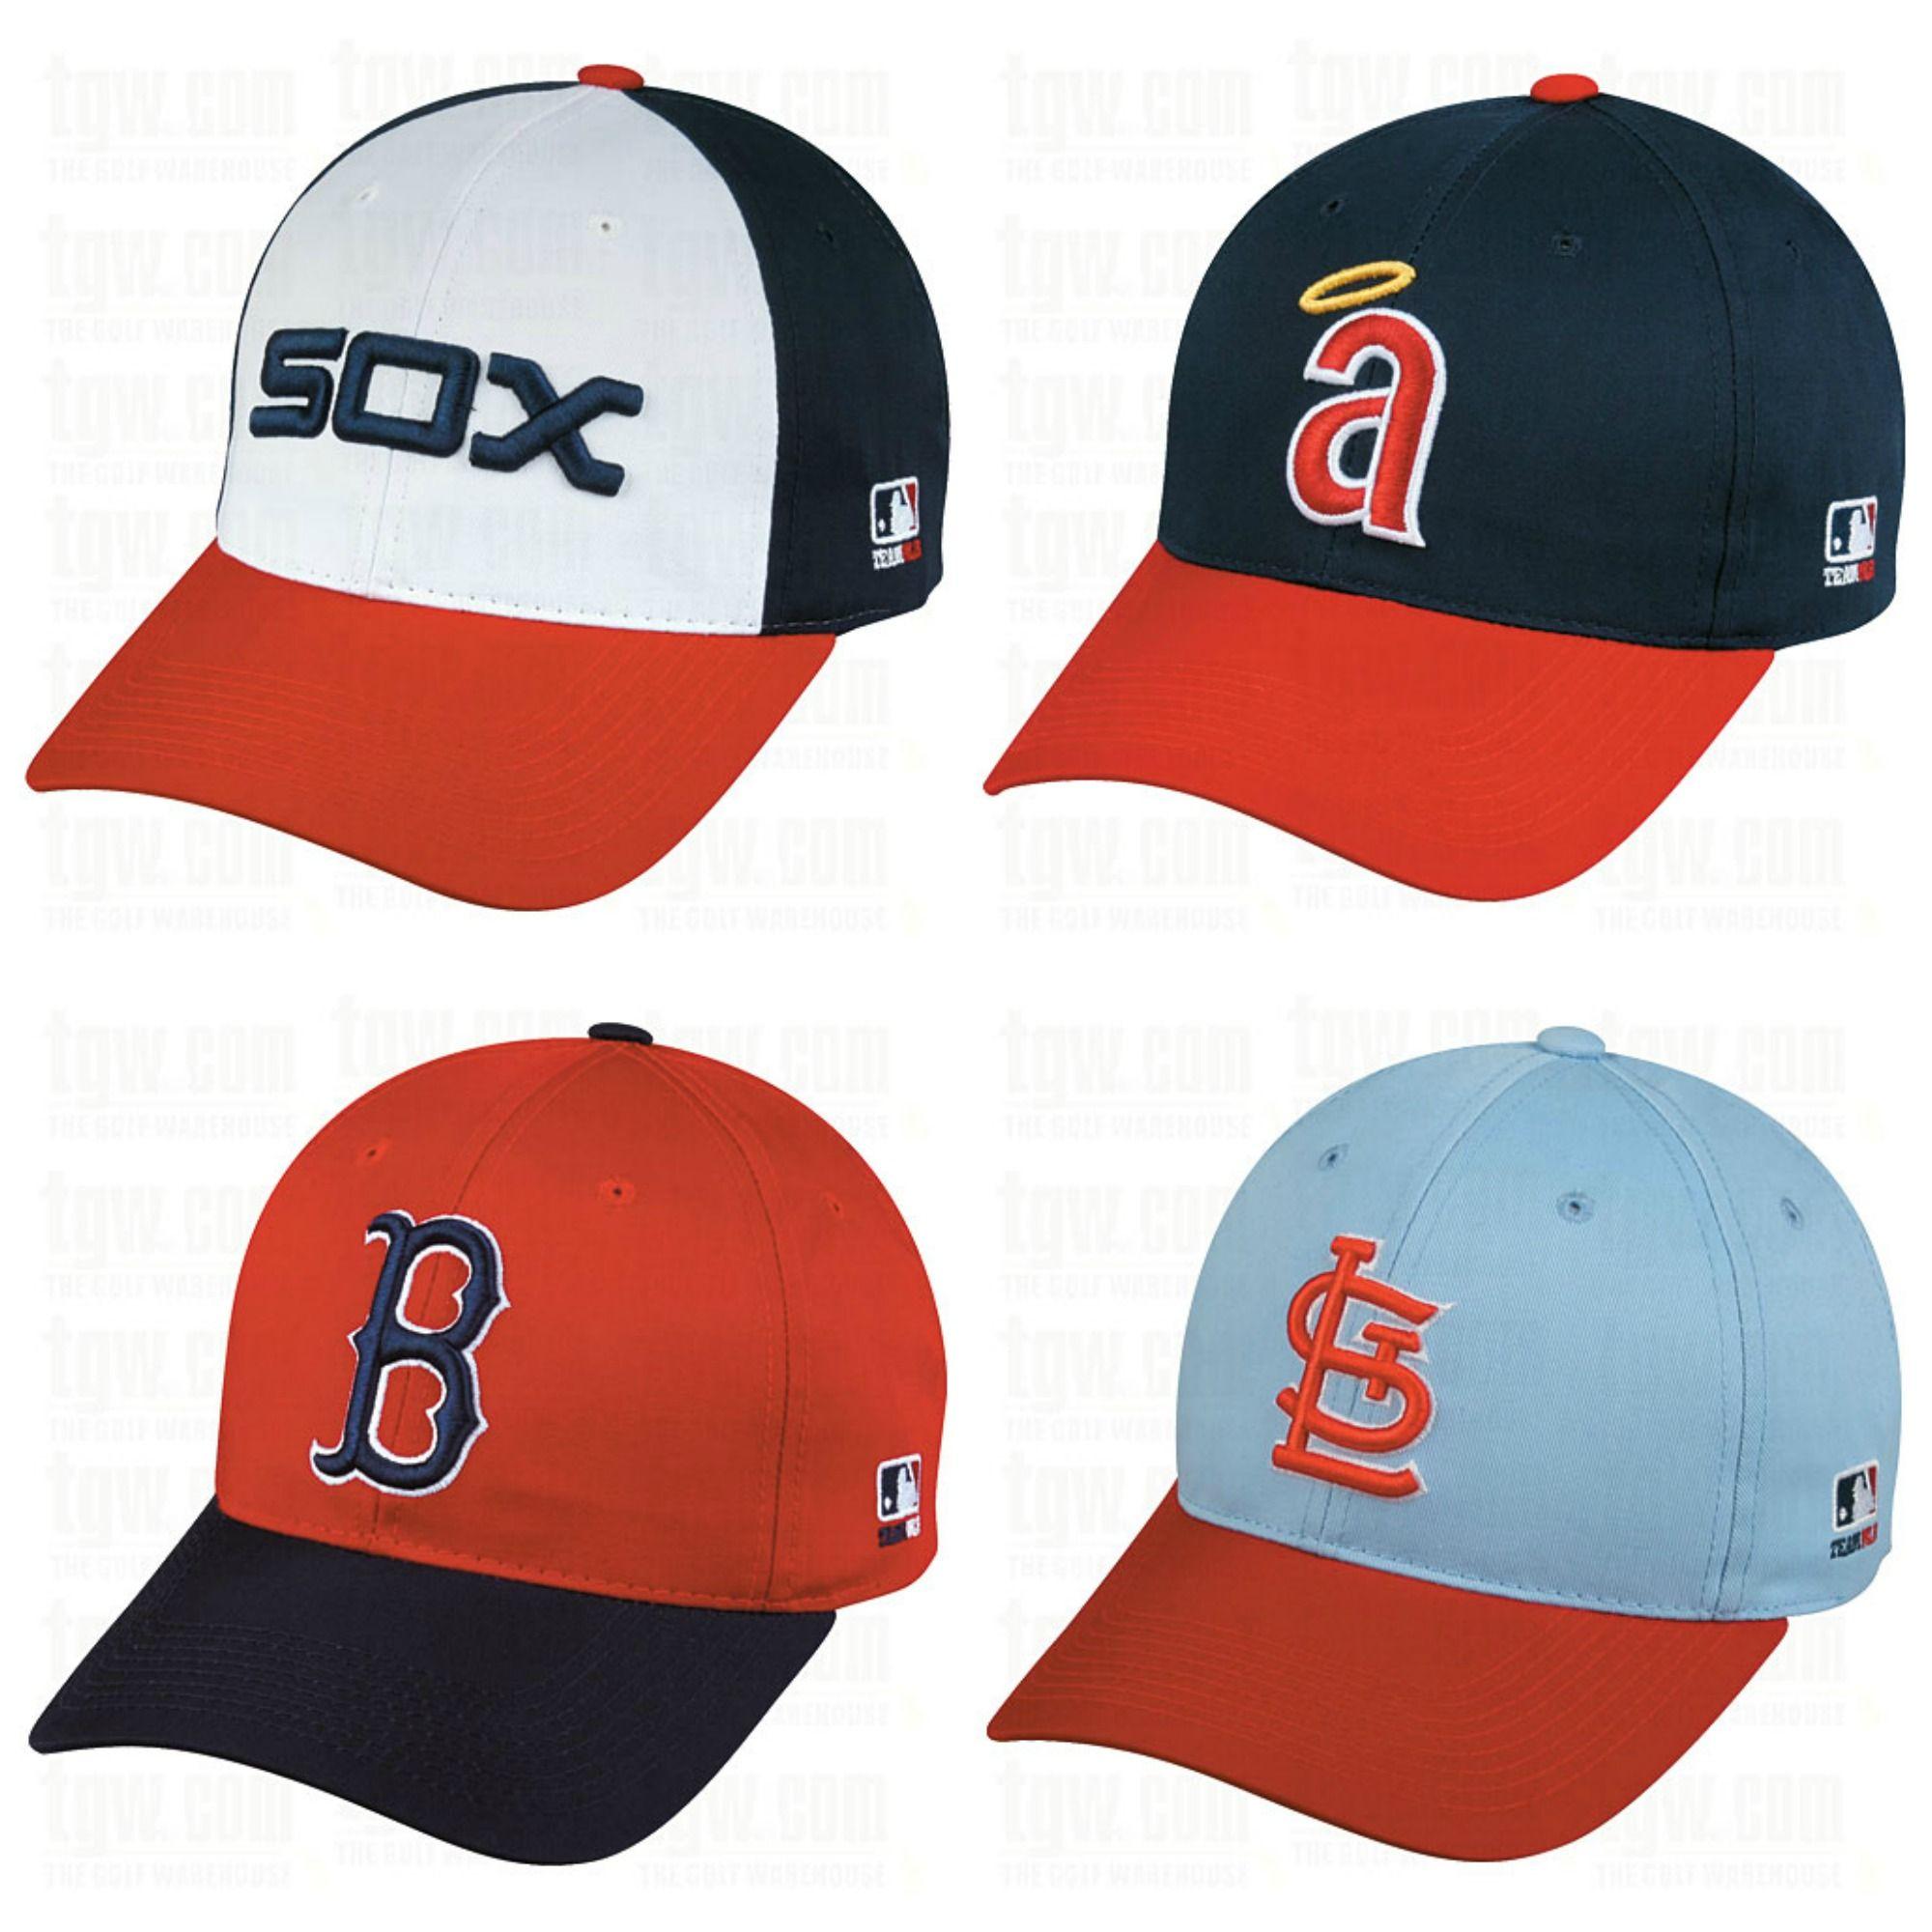 Outdoor Cap Co Mens Mlb Cooperstown Caps Mlb Hats Baseballsavings Mlb Apparel Baseball Equipment Baseball Savings